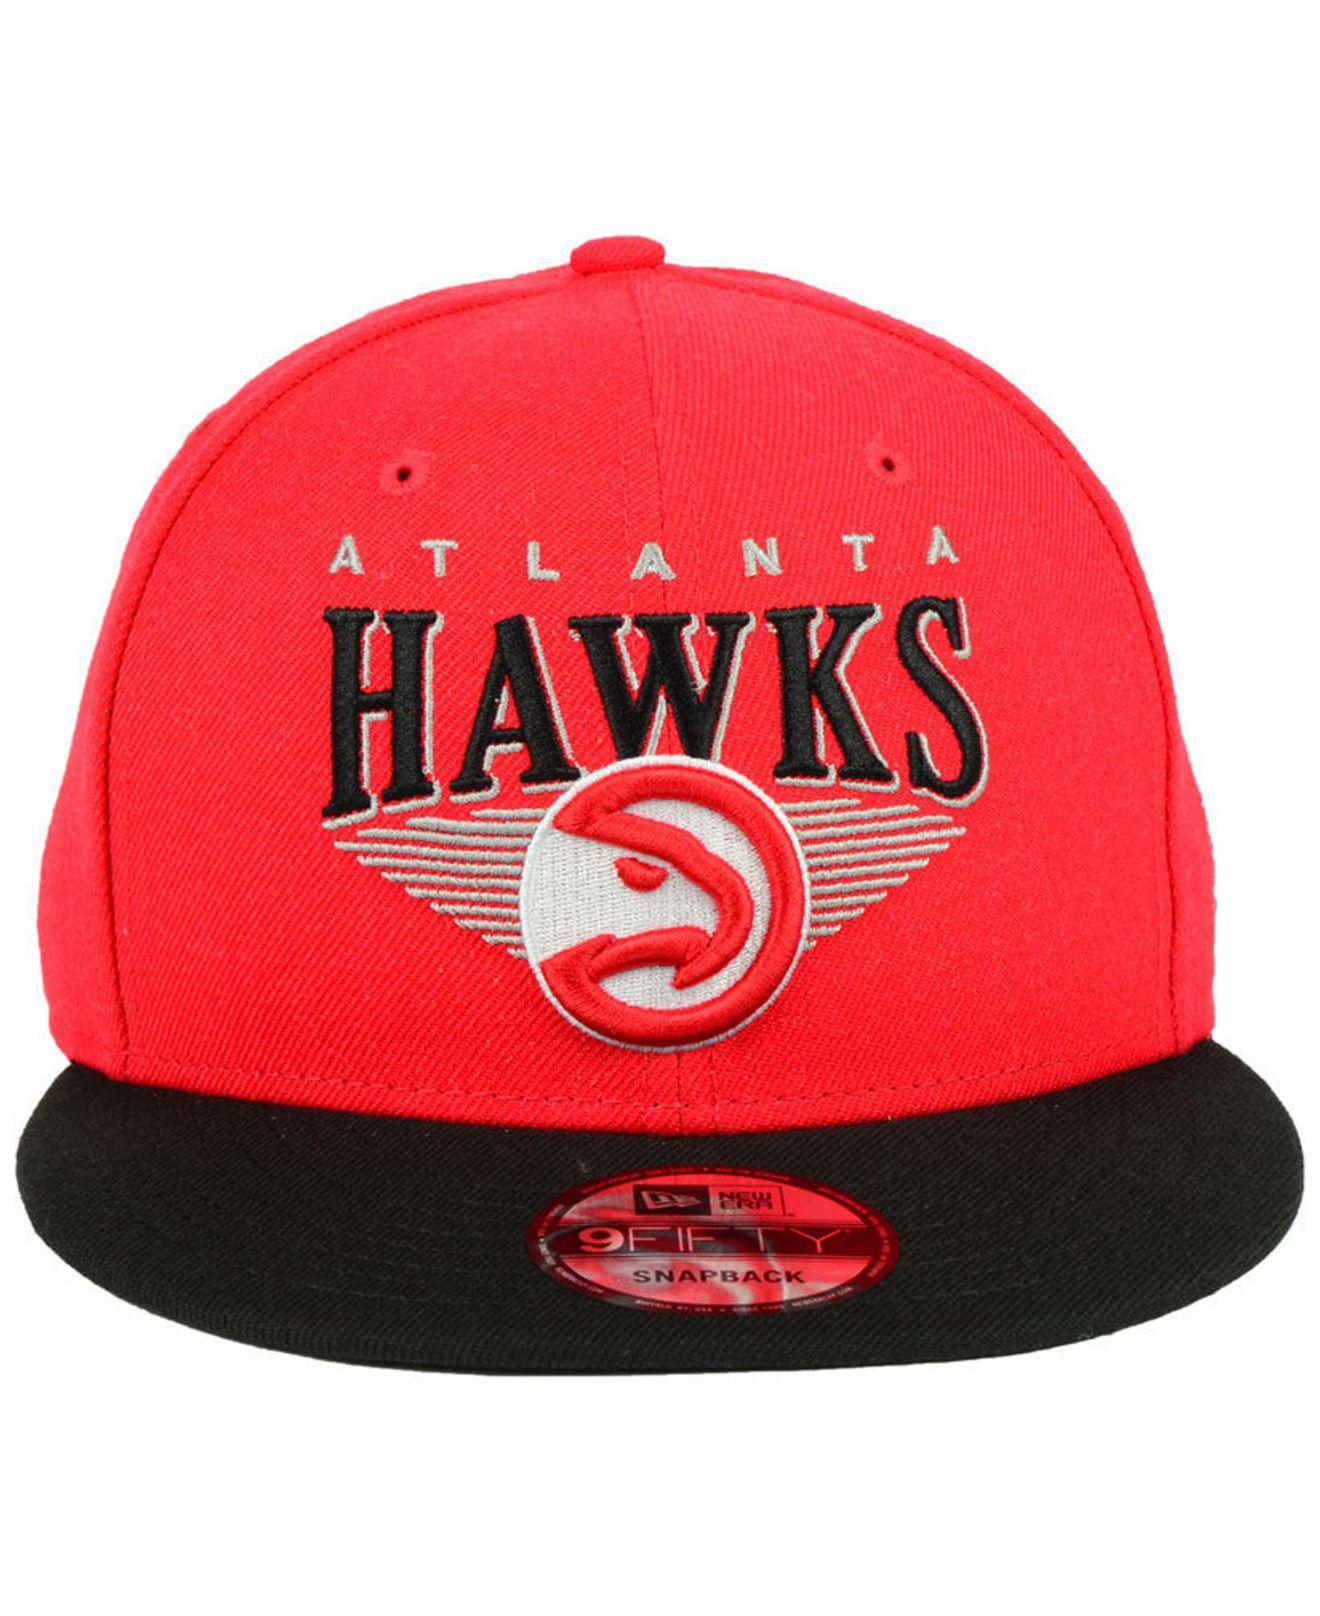 the latest 92a21 aaa65 Lyst - KTZ Atlanta Hawks Retro Triangle 9fifty Snapback Cap in Red for Men